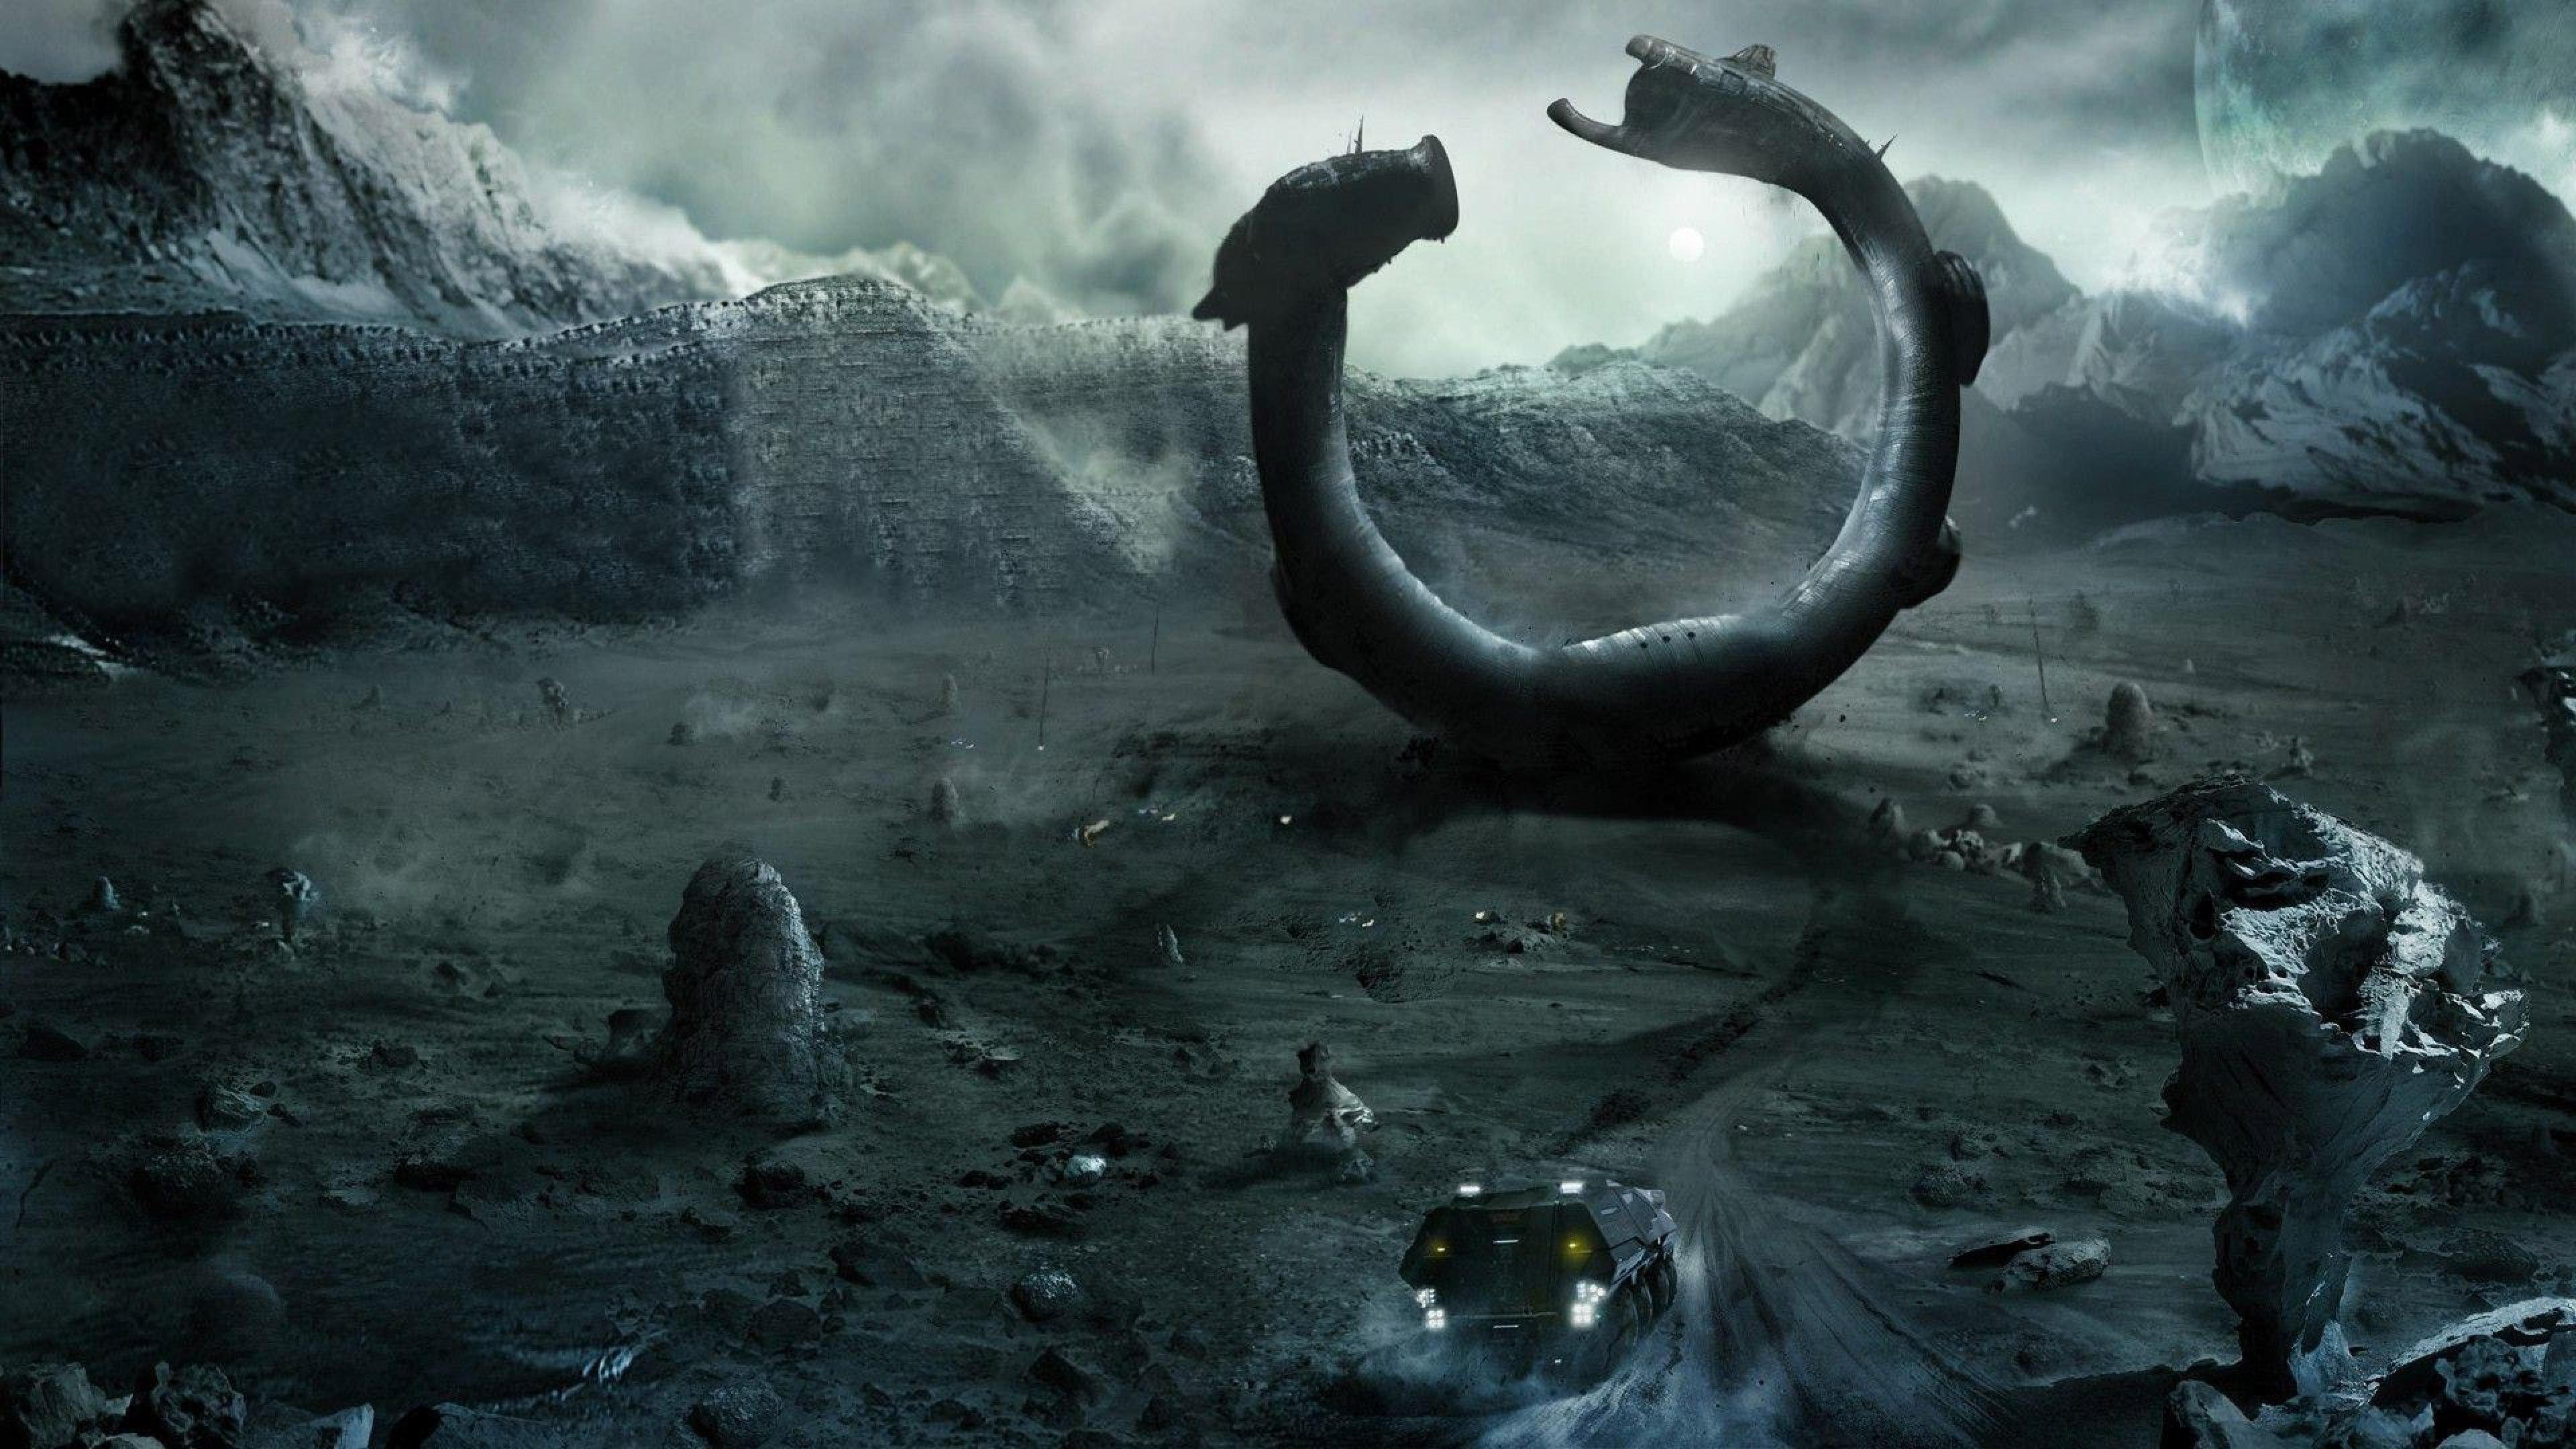 Prometheus 4k Wallpapers Top Free Prometheus 4k